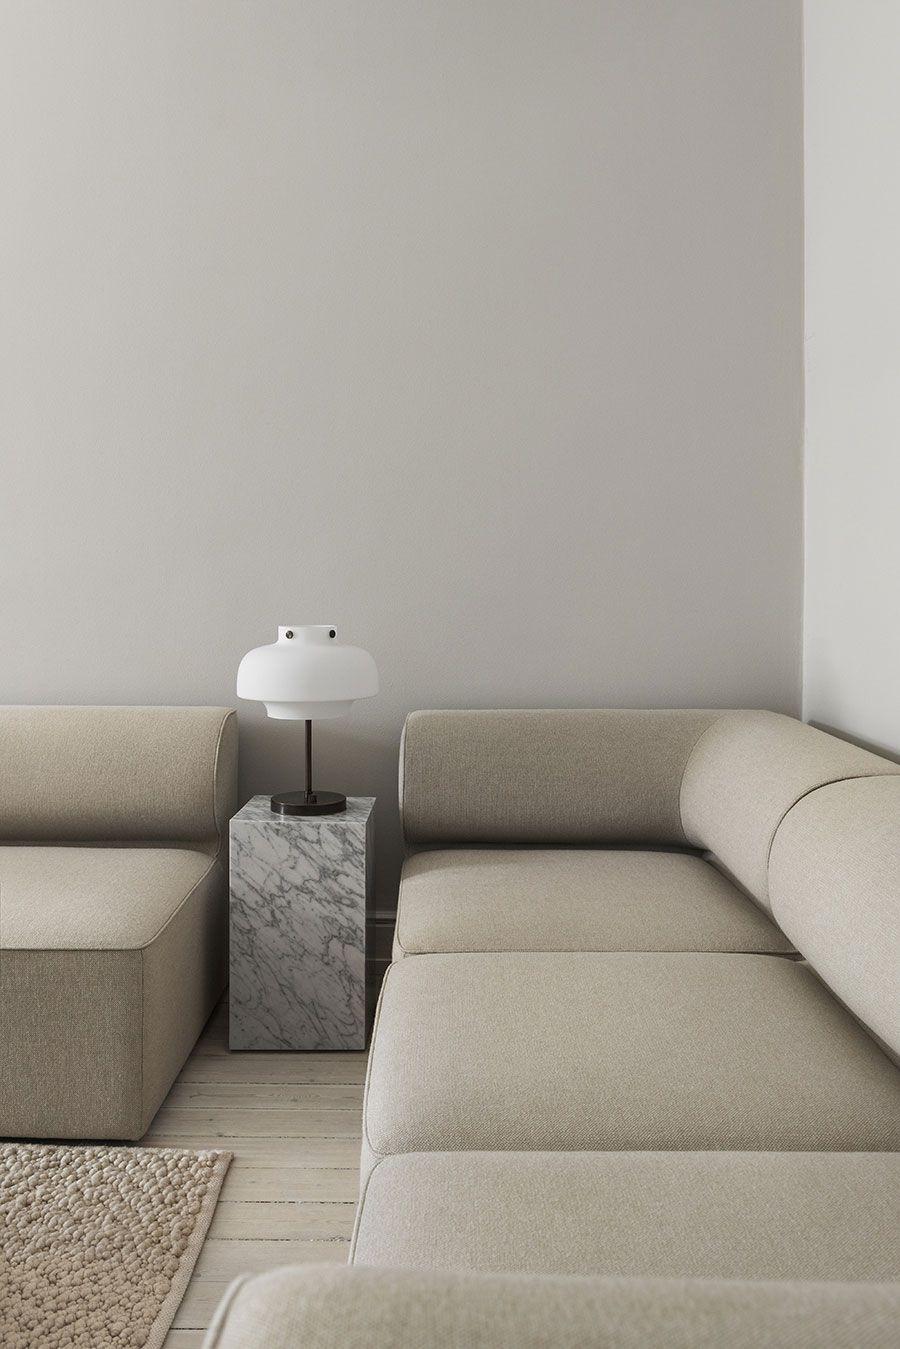 Plinth Side Table Cheap Bedroom Decor Furniture Decor Furniture